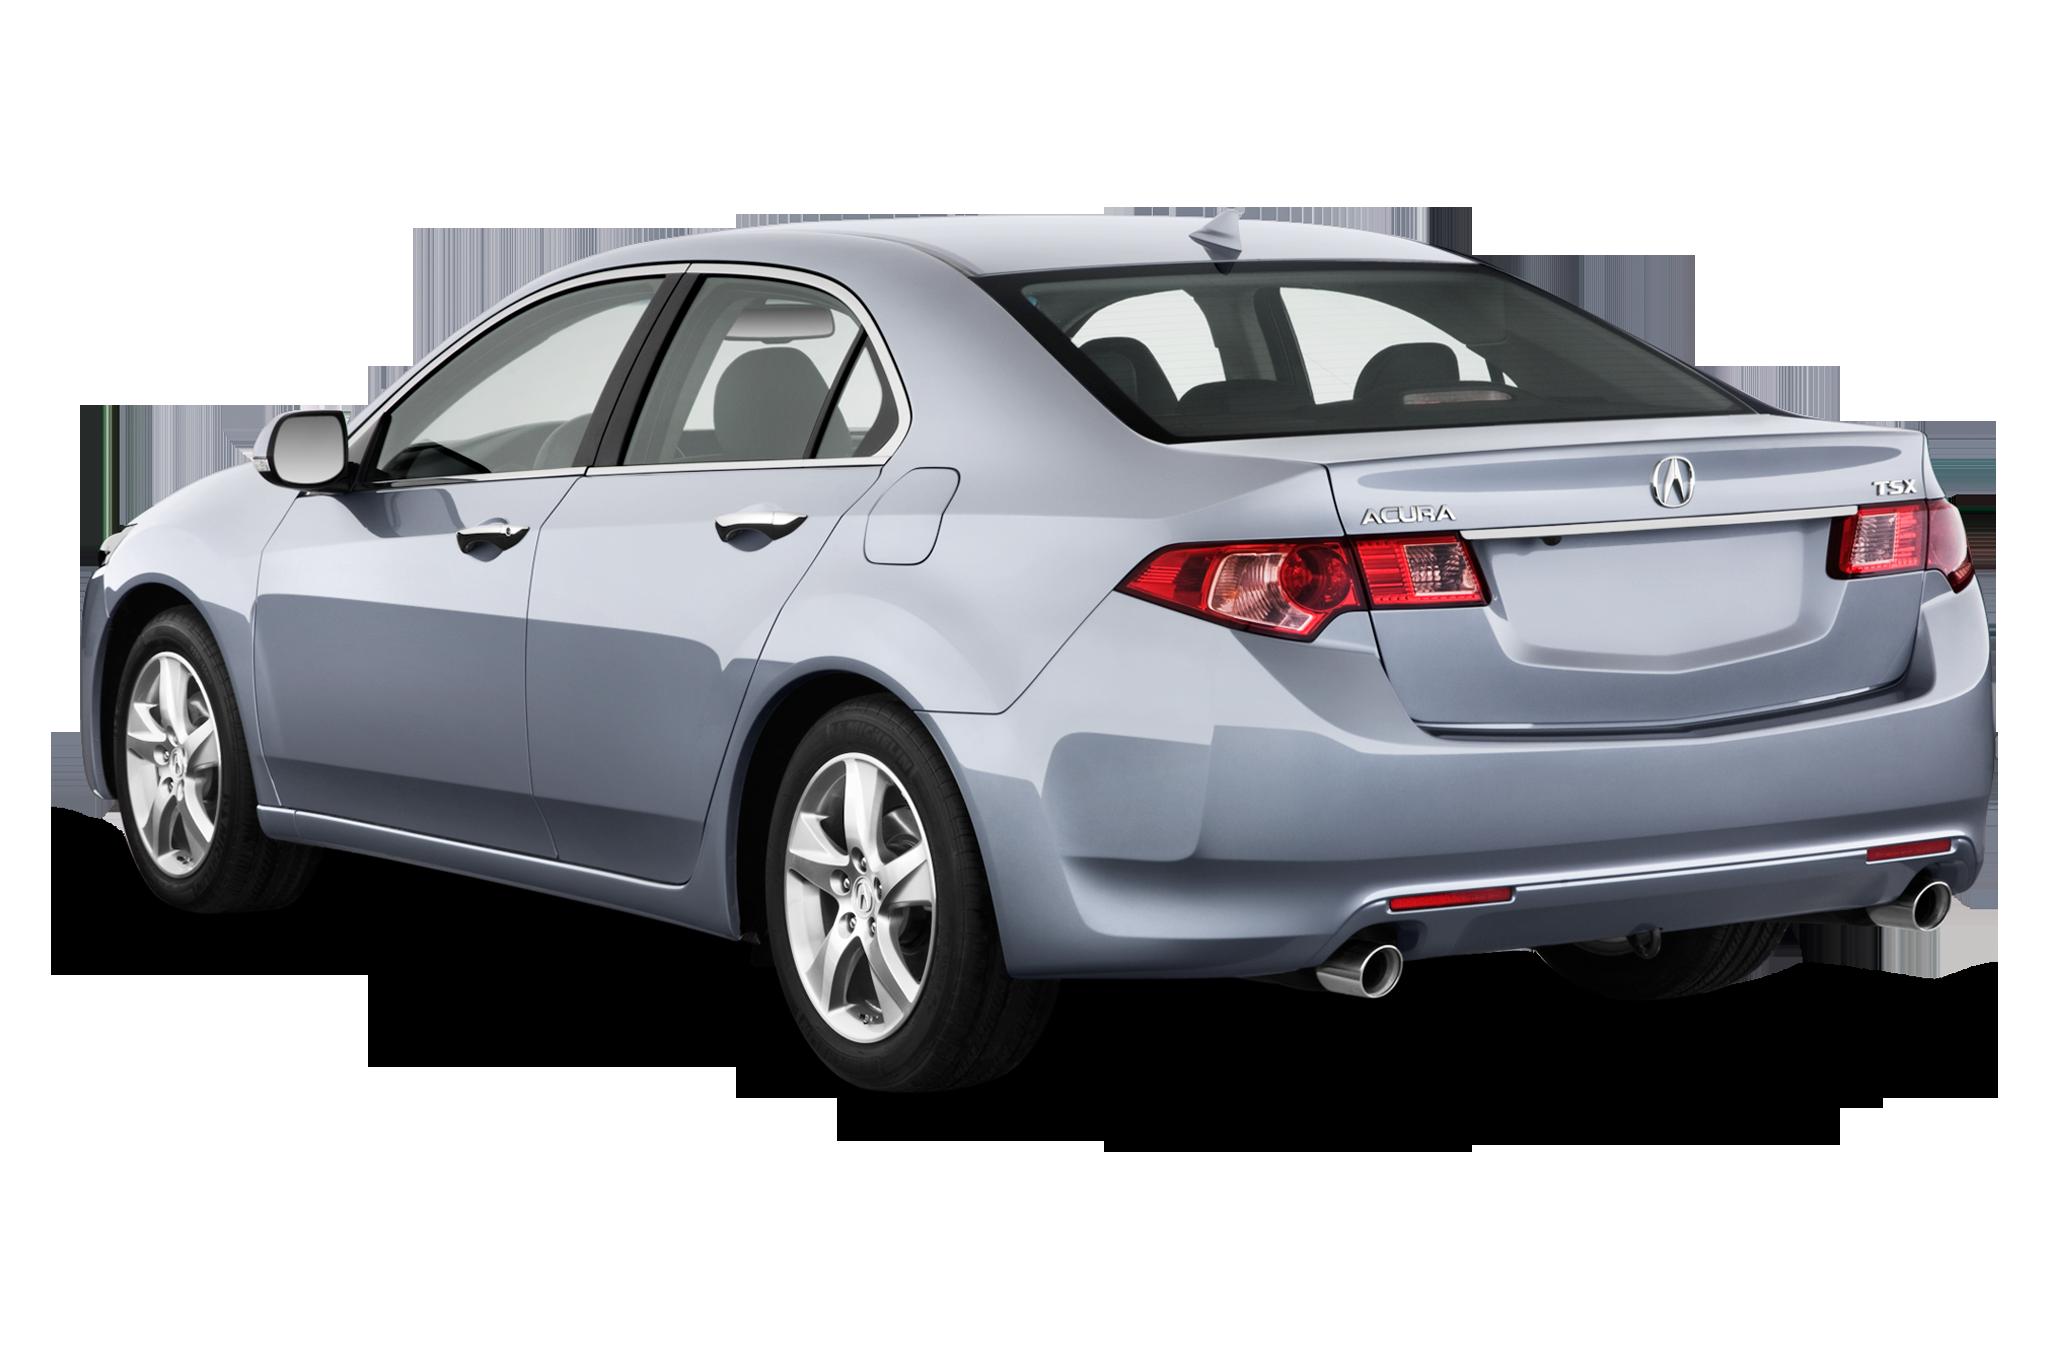 cars listings full dsc buy used acura nashville here sedan tl pay